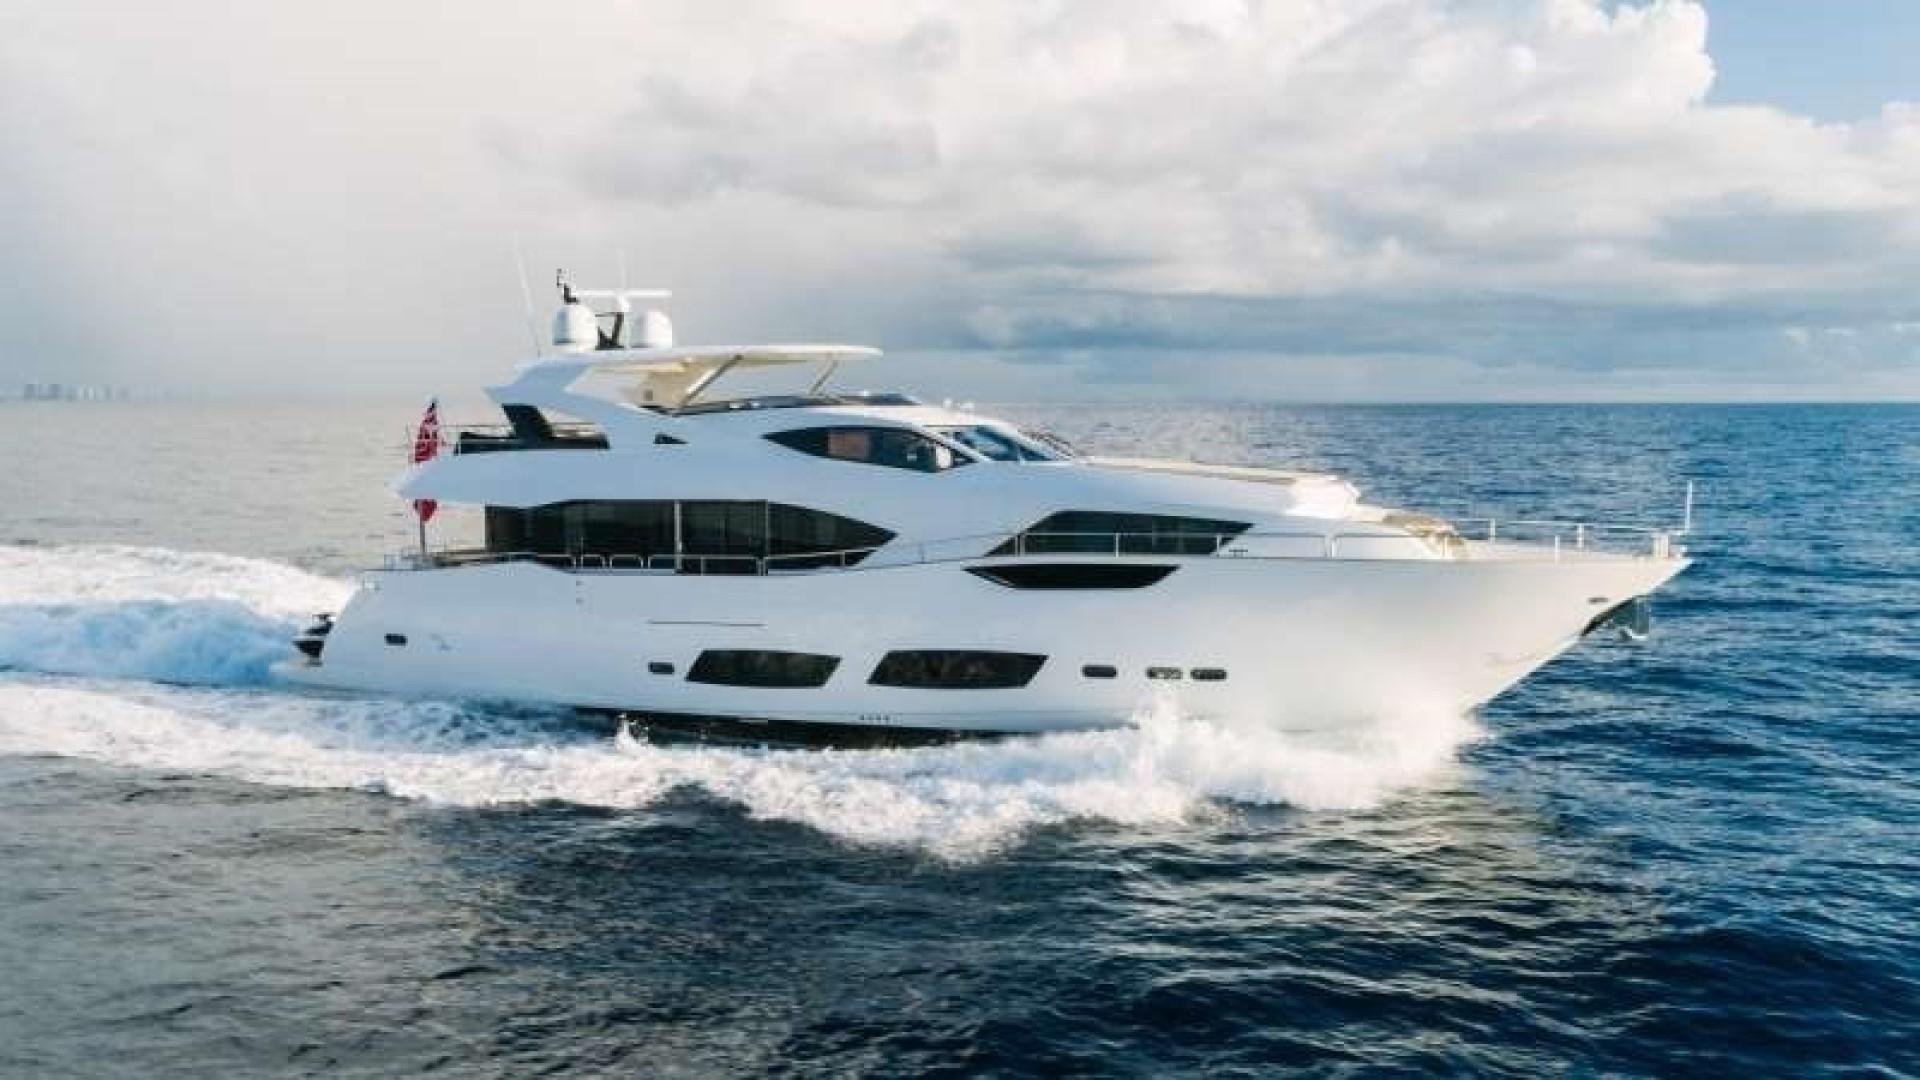 Sunseeker-95 Yacht 2017-Perseverance 3 Ft Lauderdale-Florida-United States-1400119   Thumbnail